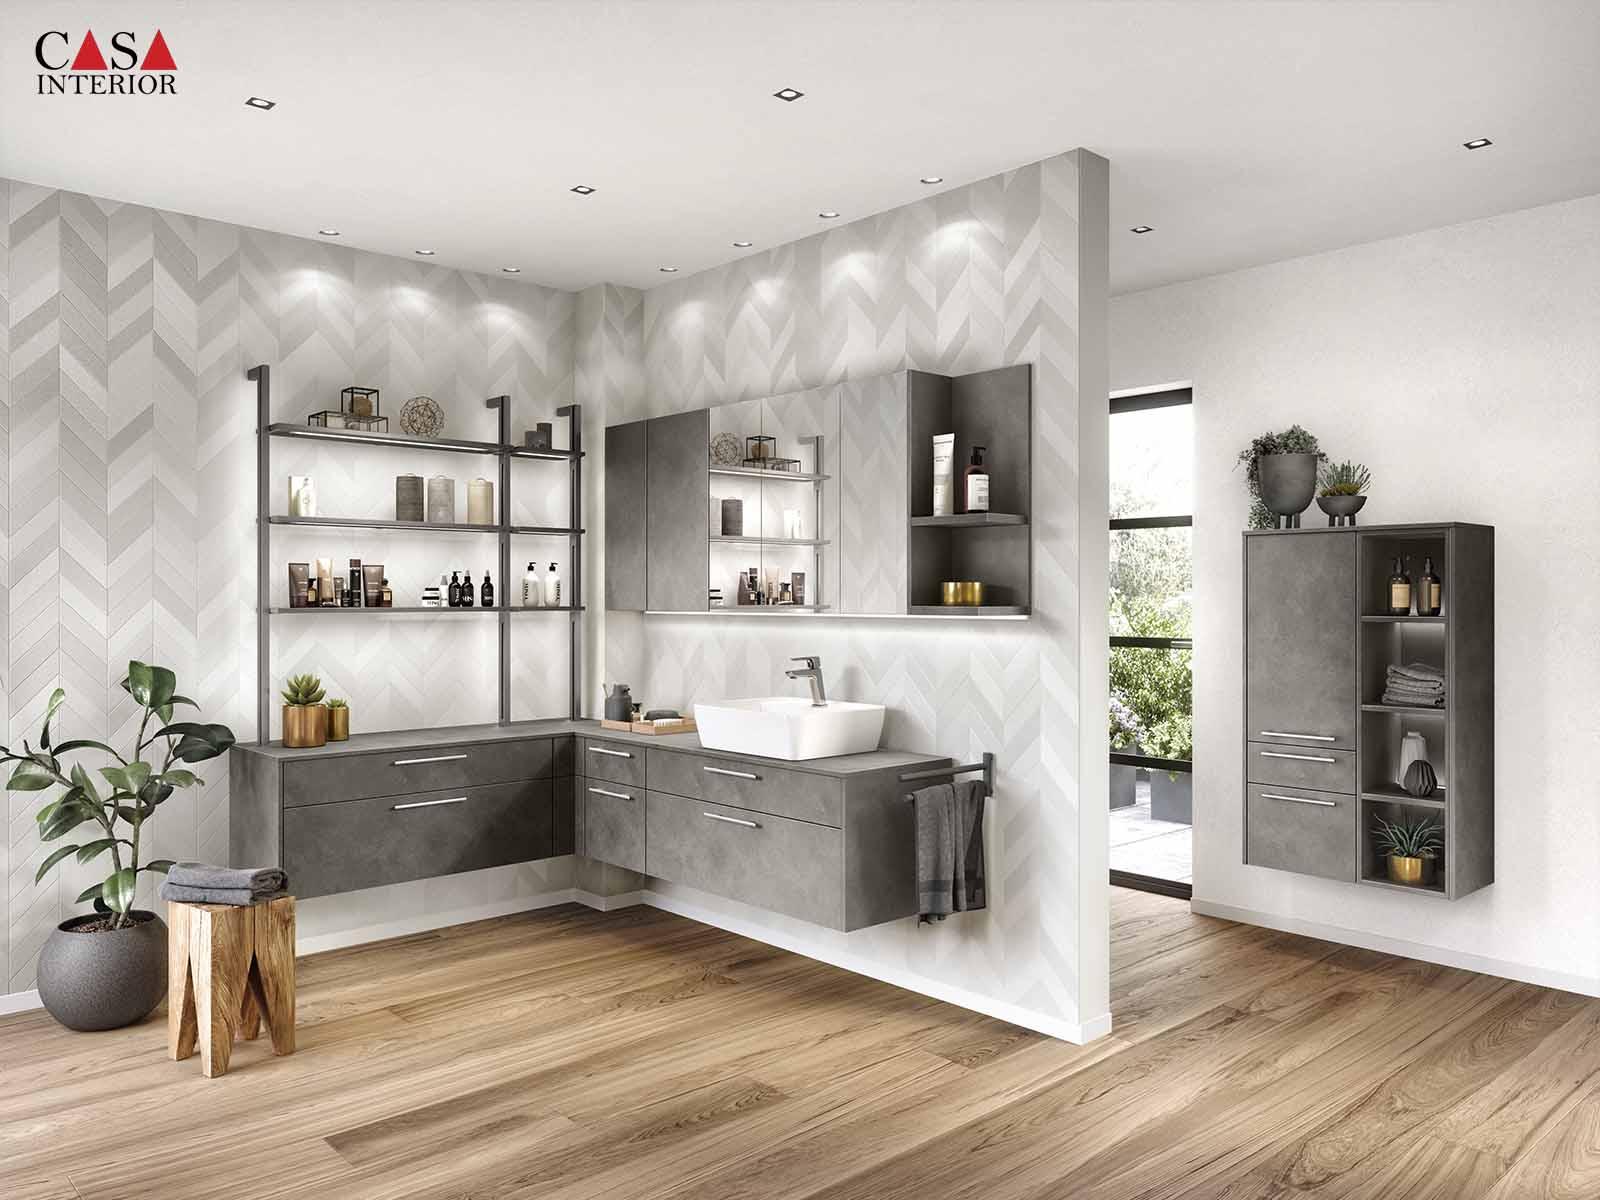 Küchentime Riva Concrete Terra grey reproduction 839 - Bathroom